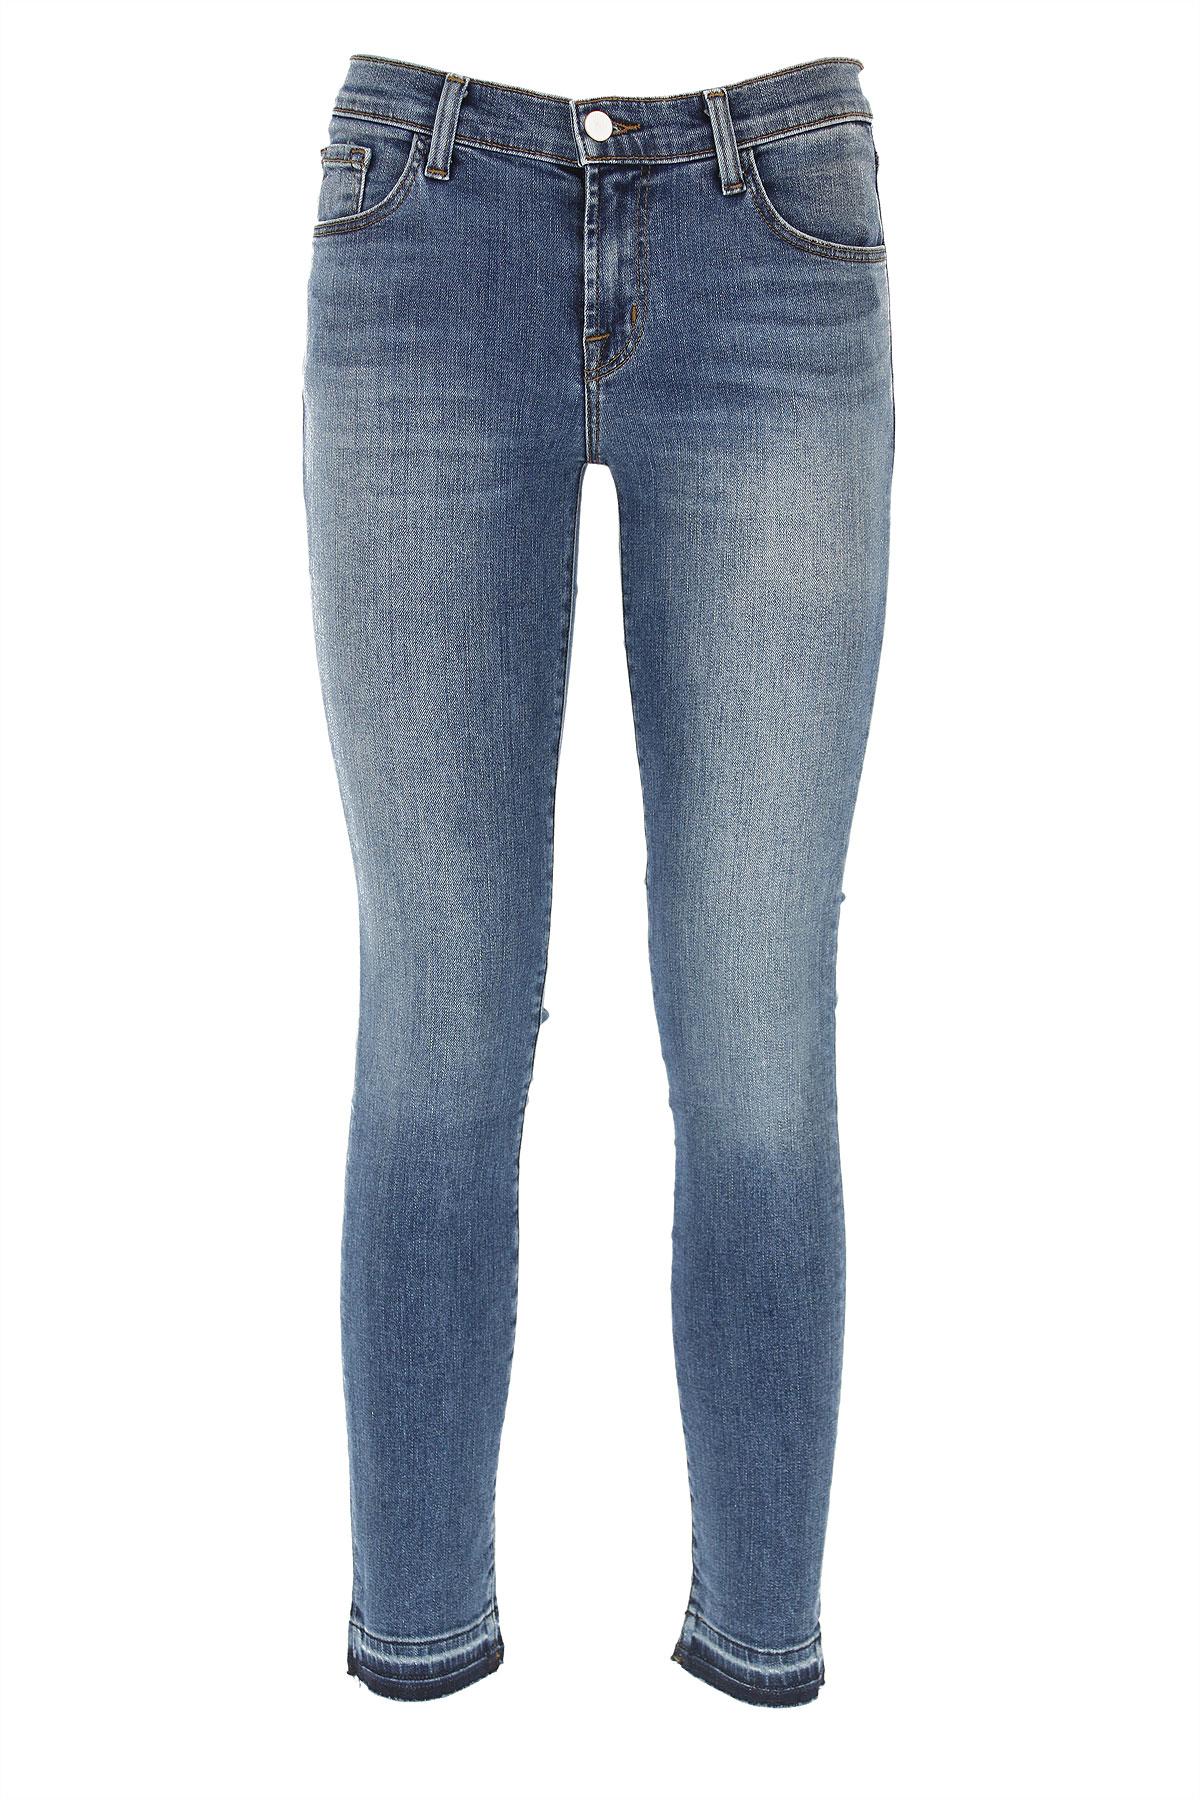 J Brand Jeans On Sale, Denim Blue, Cotton, 2017, 24 25 27 28